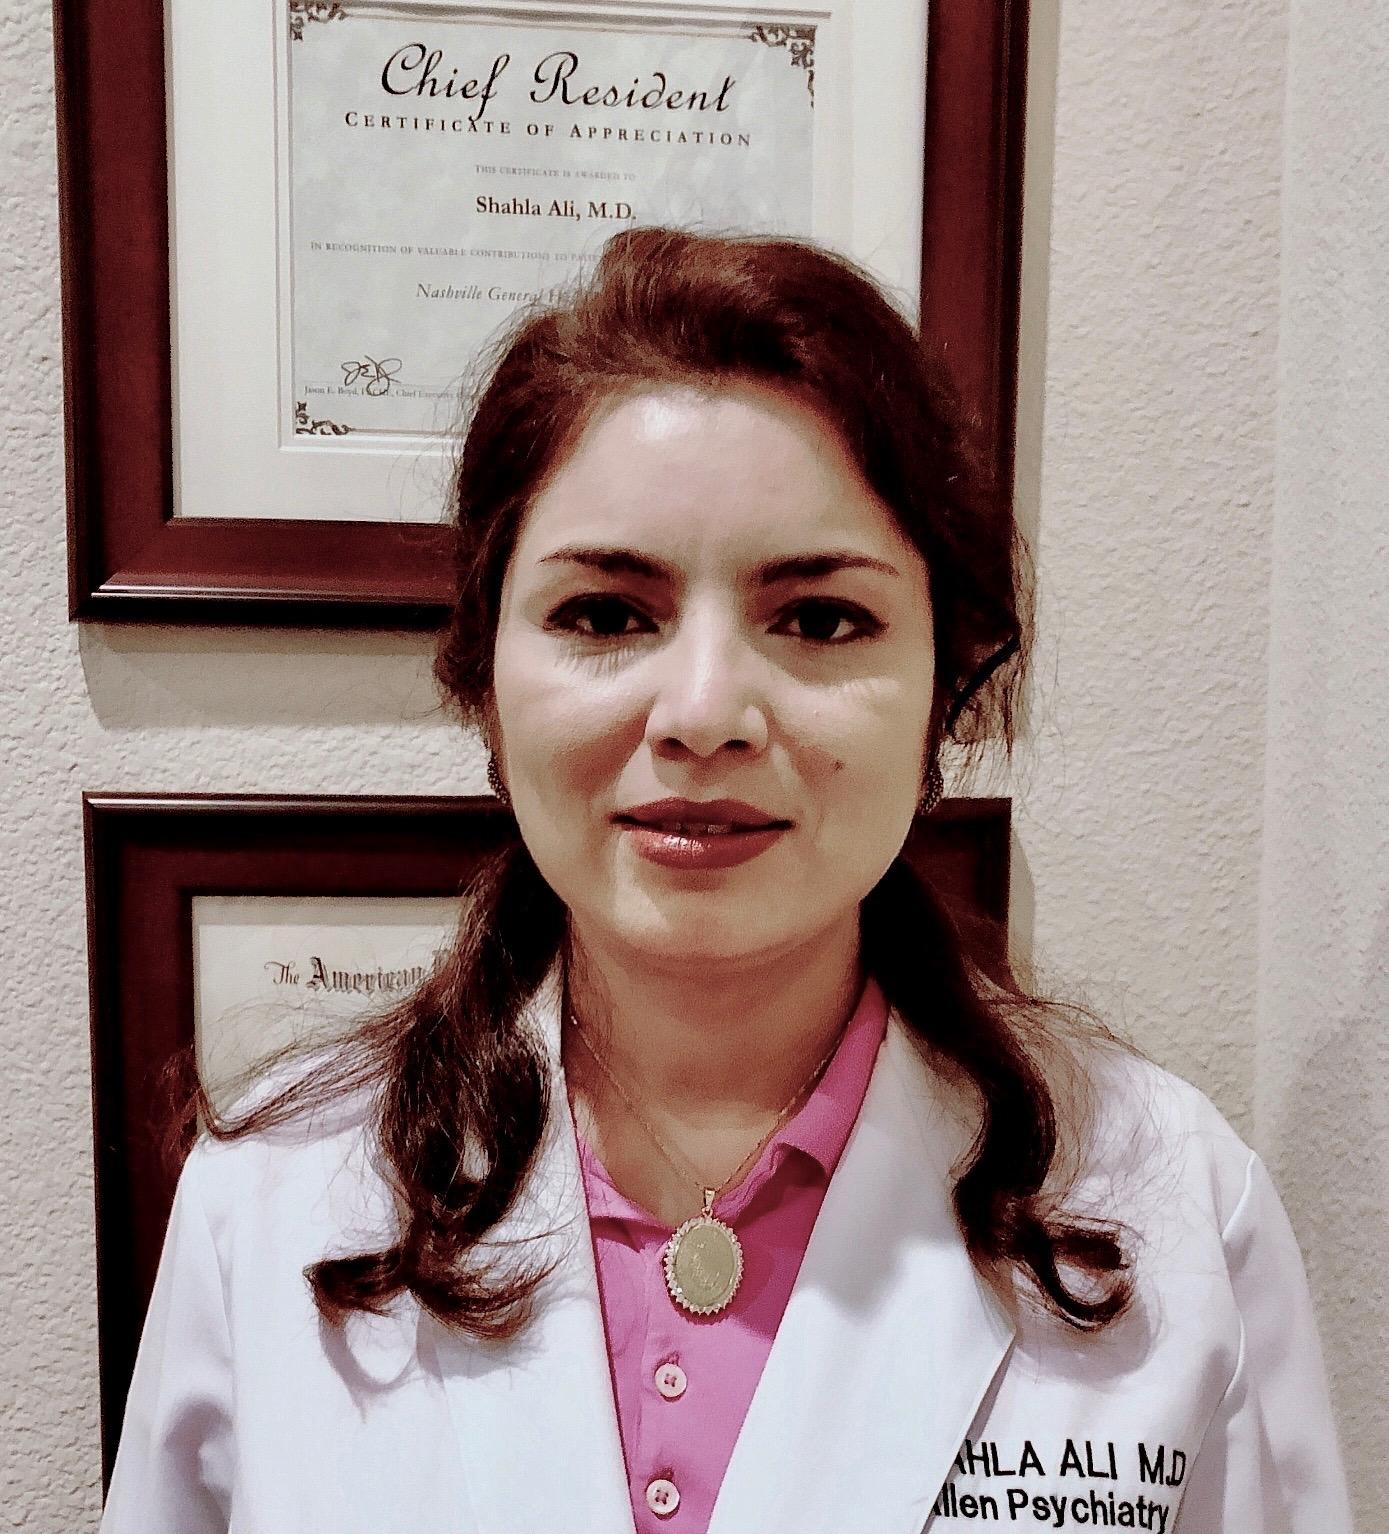 Dr. Shahla Ali